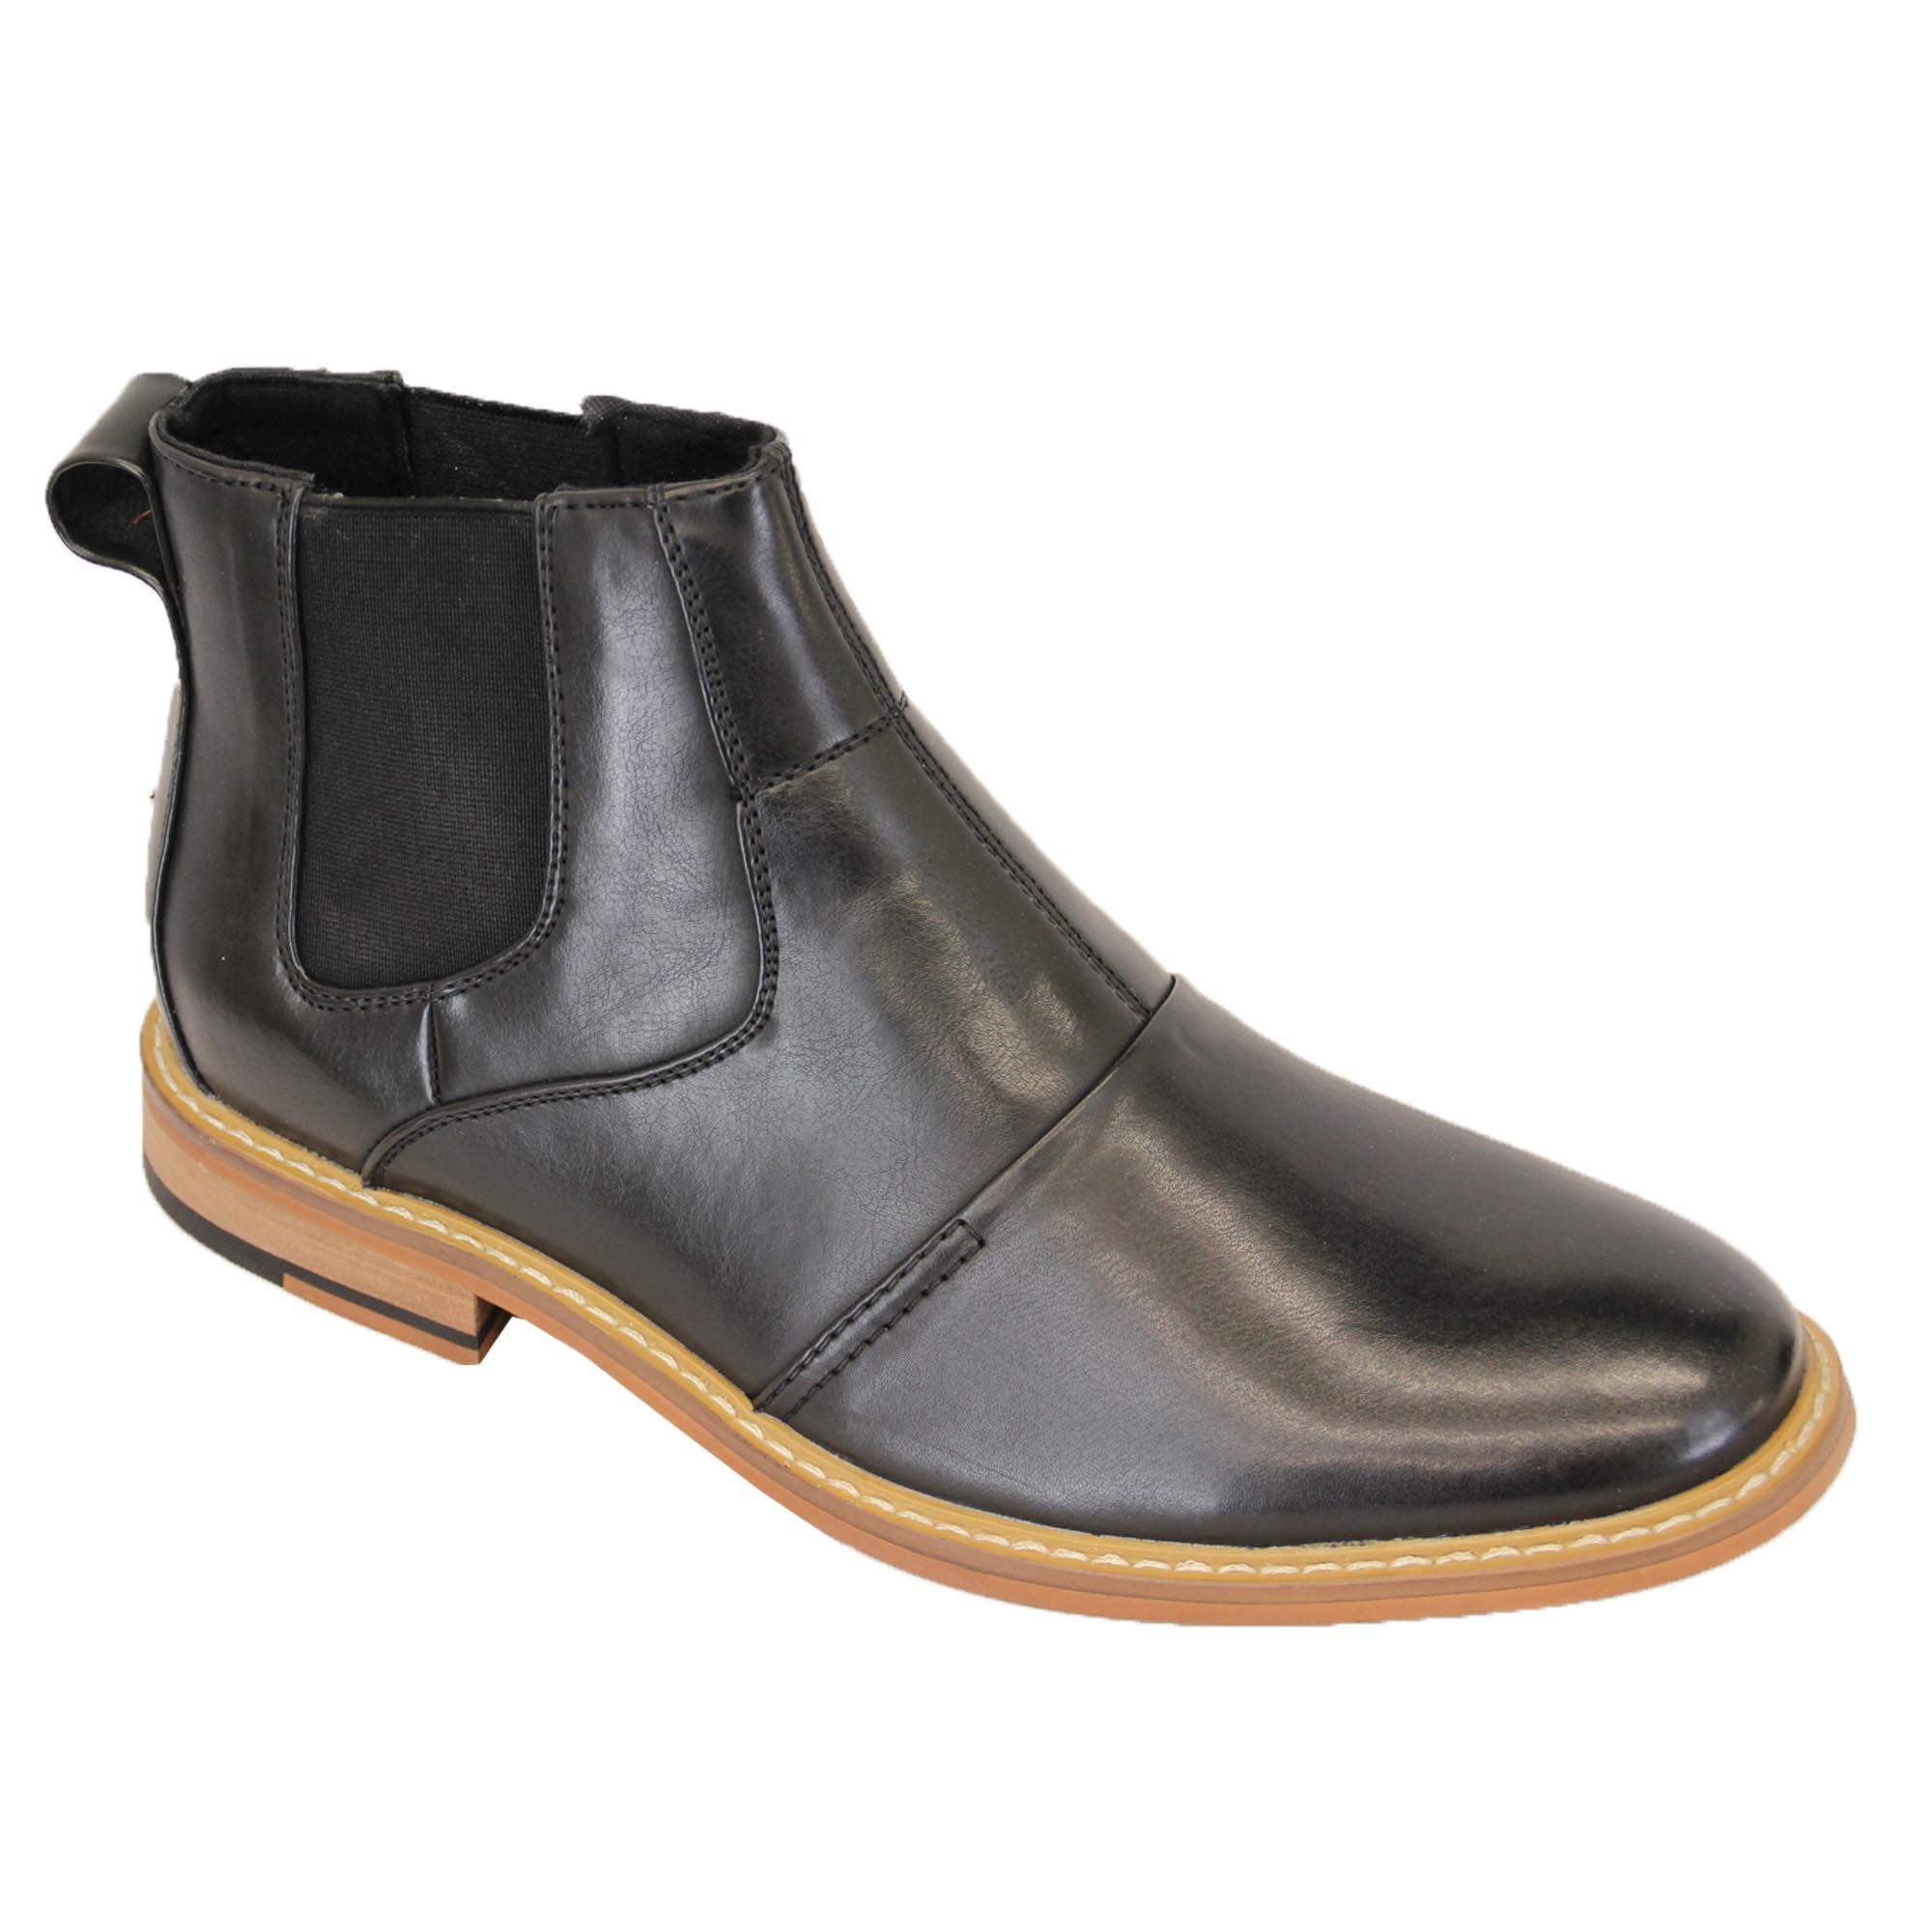 Mens Cavani Boots Chelsea Dealer Shoes High Ankle Leather Look Designer New   EBay